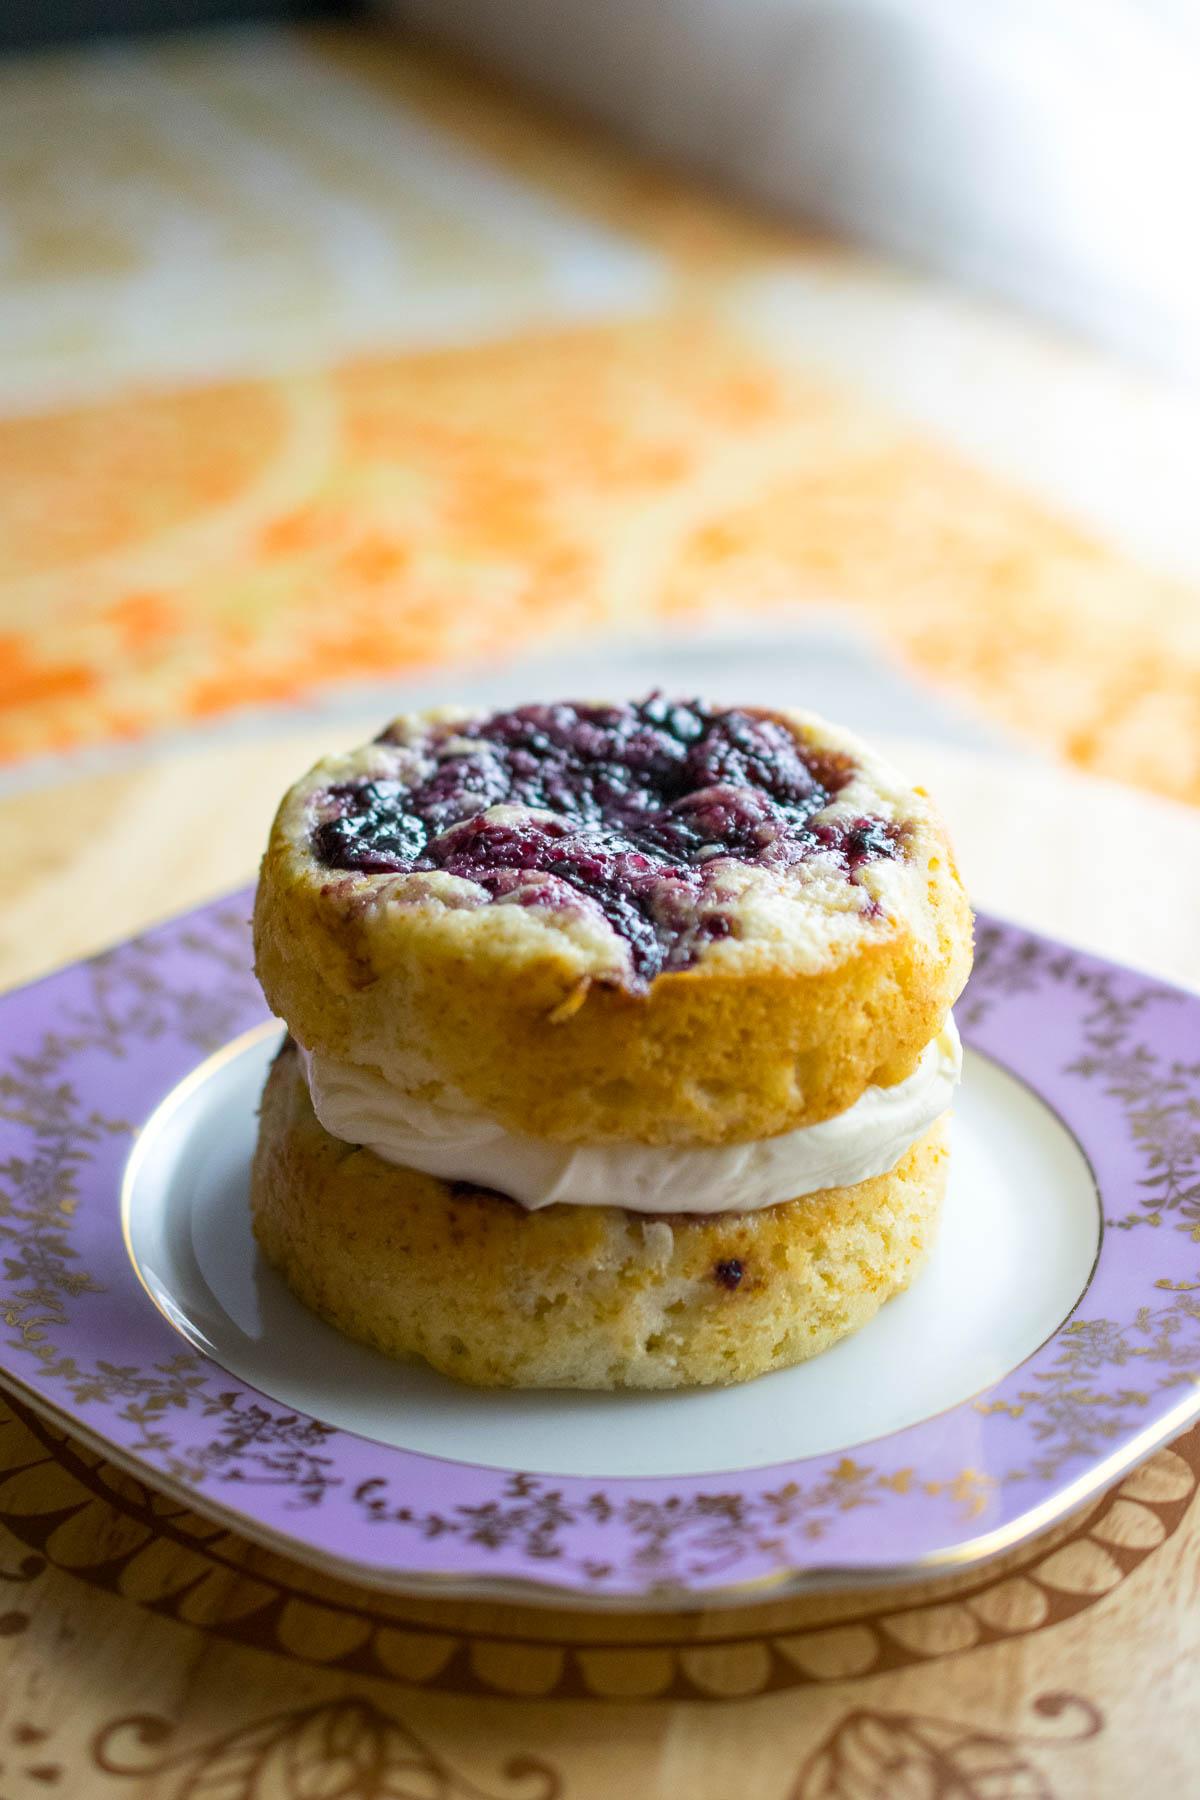 Vanilla Jam Swirl Cake for One Every Nook Cranny